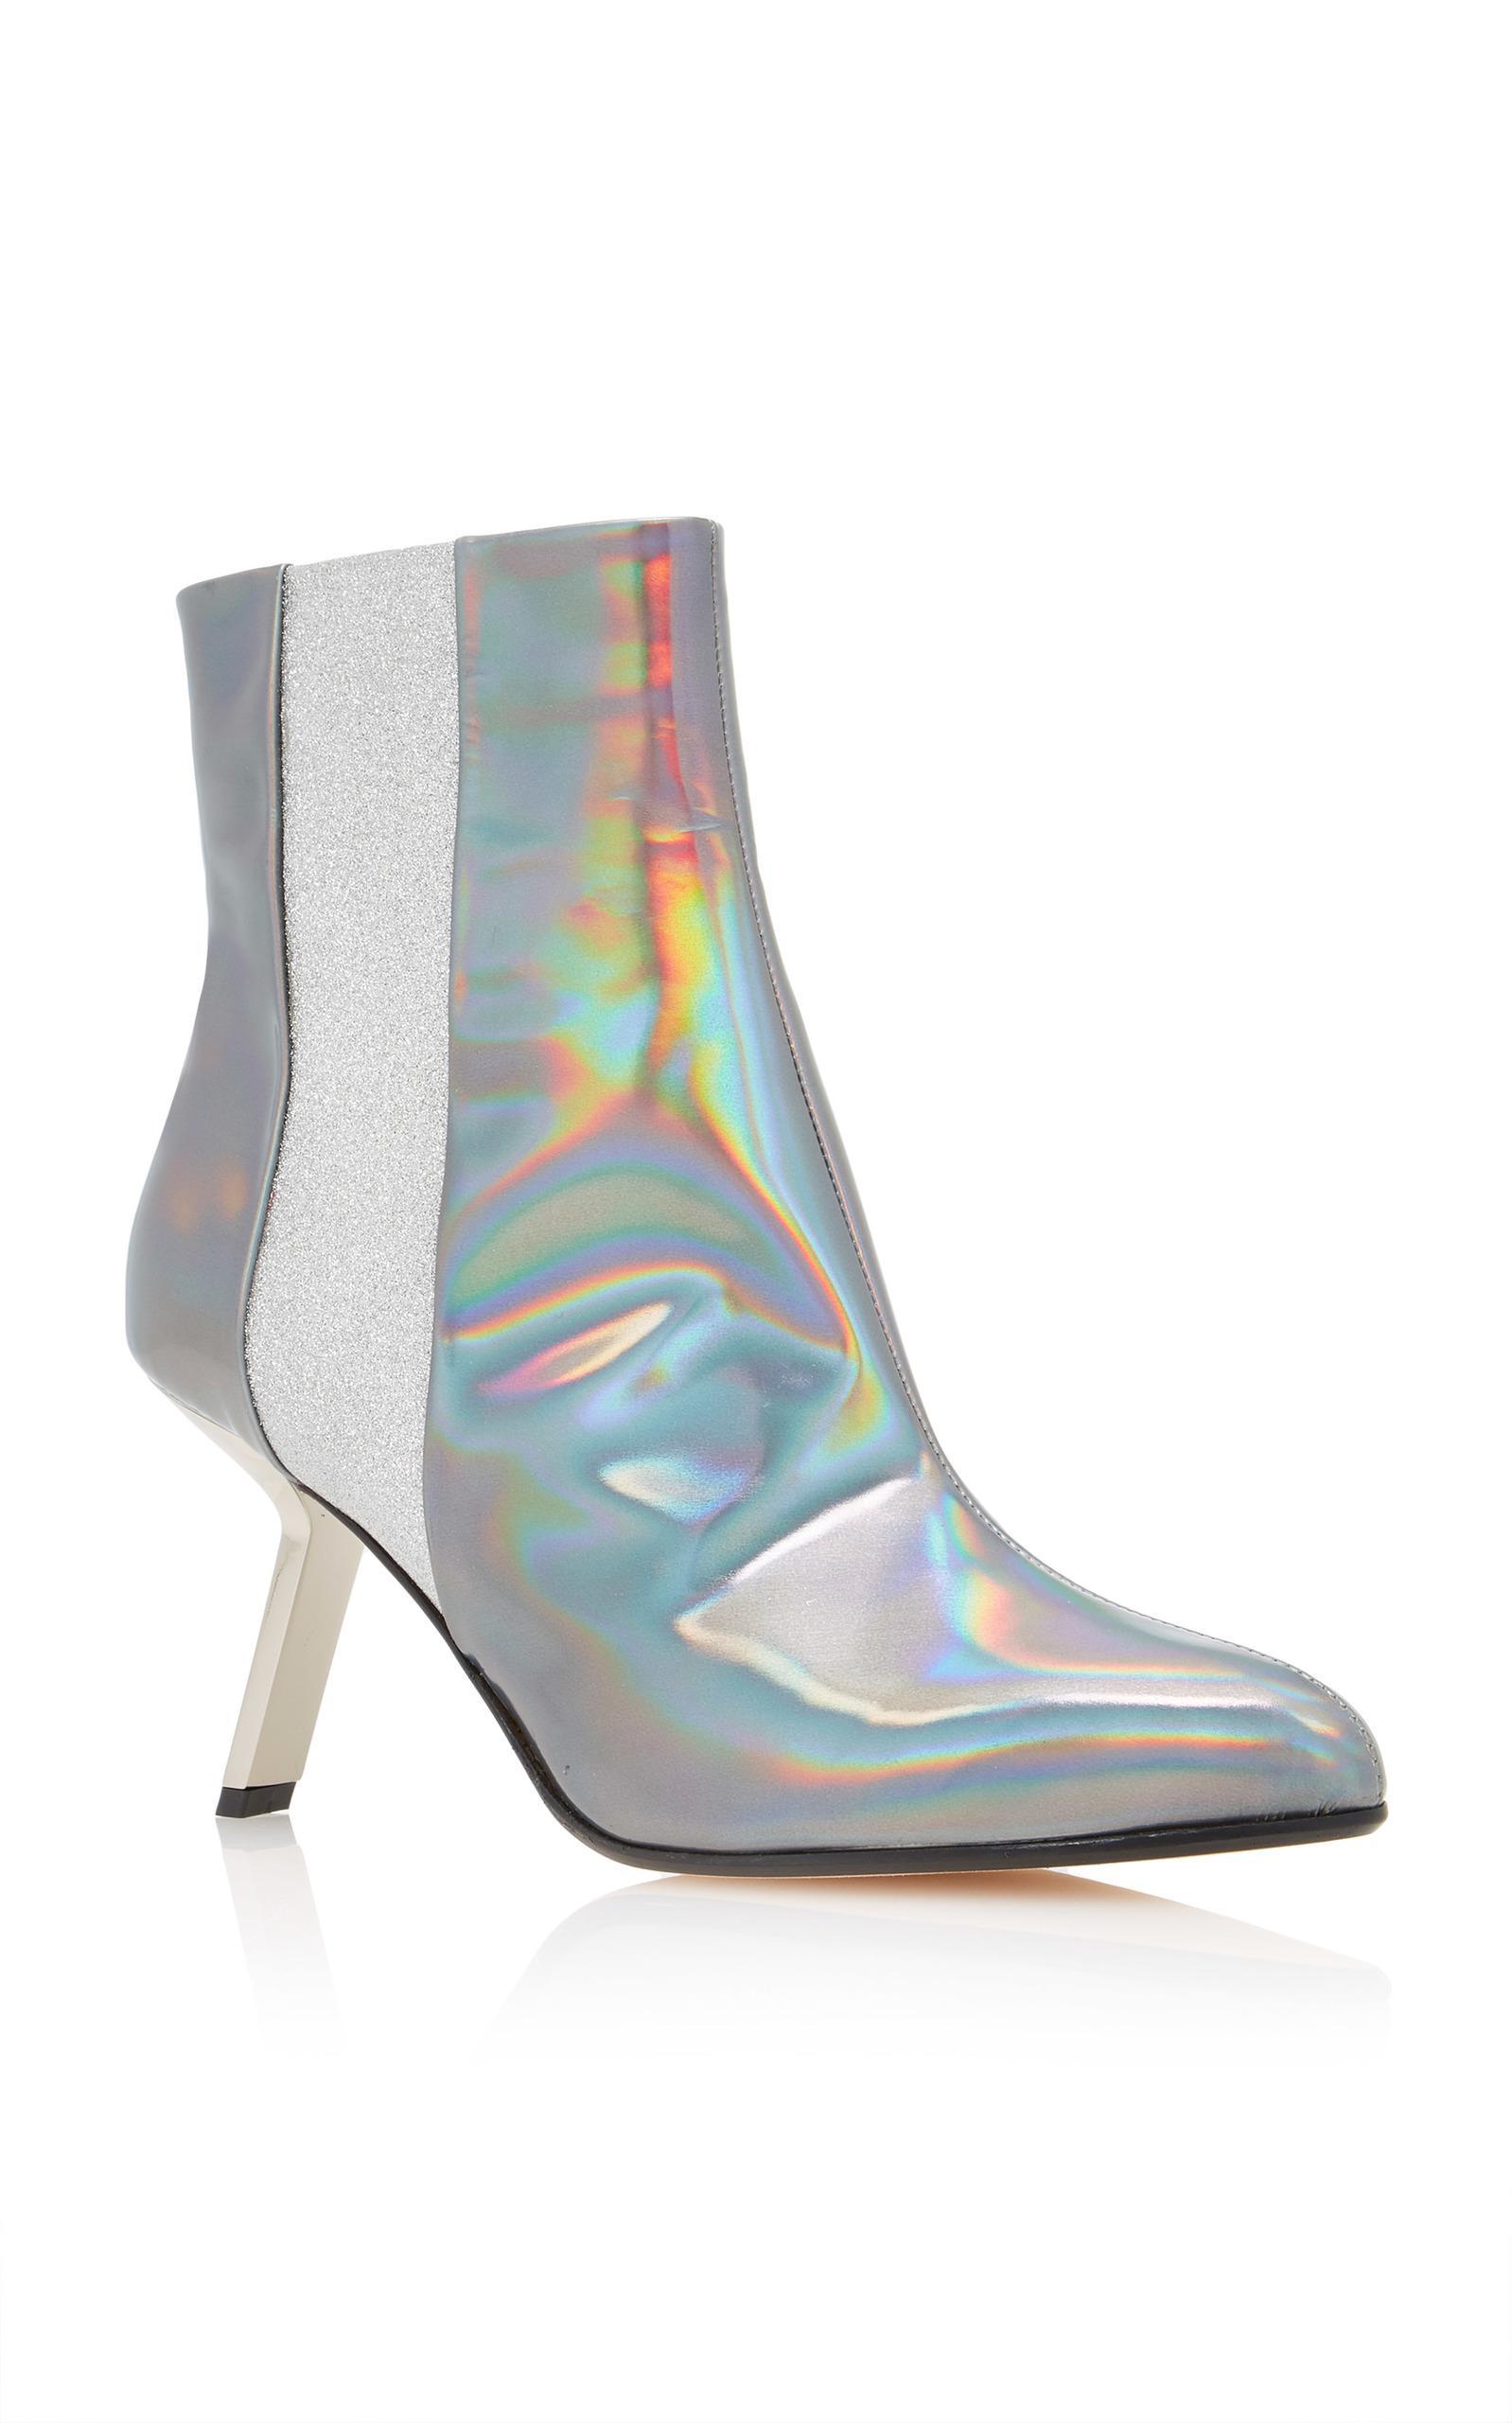 Alchimia Di Ballin Leather Hedra Hologram Bootie in Metallic